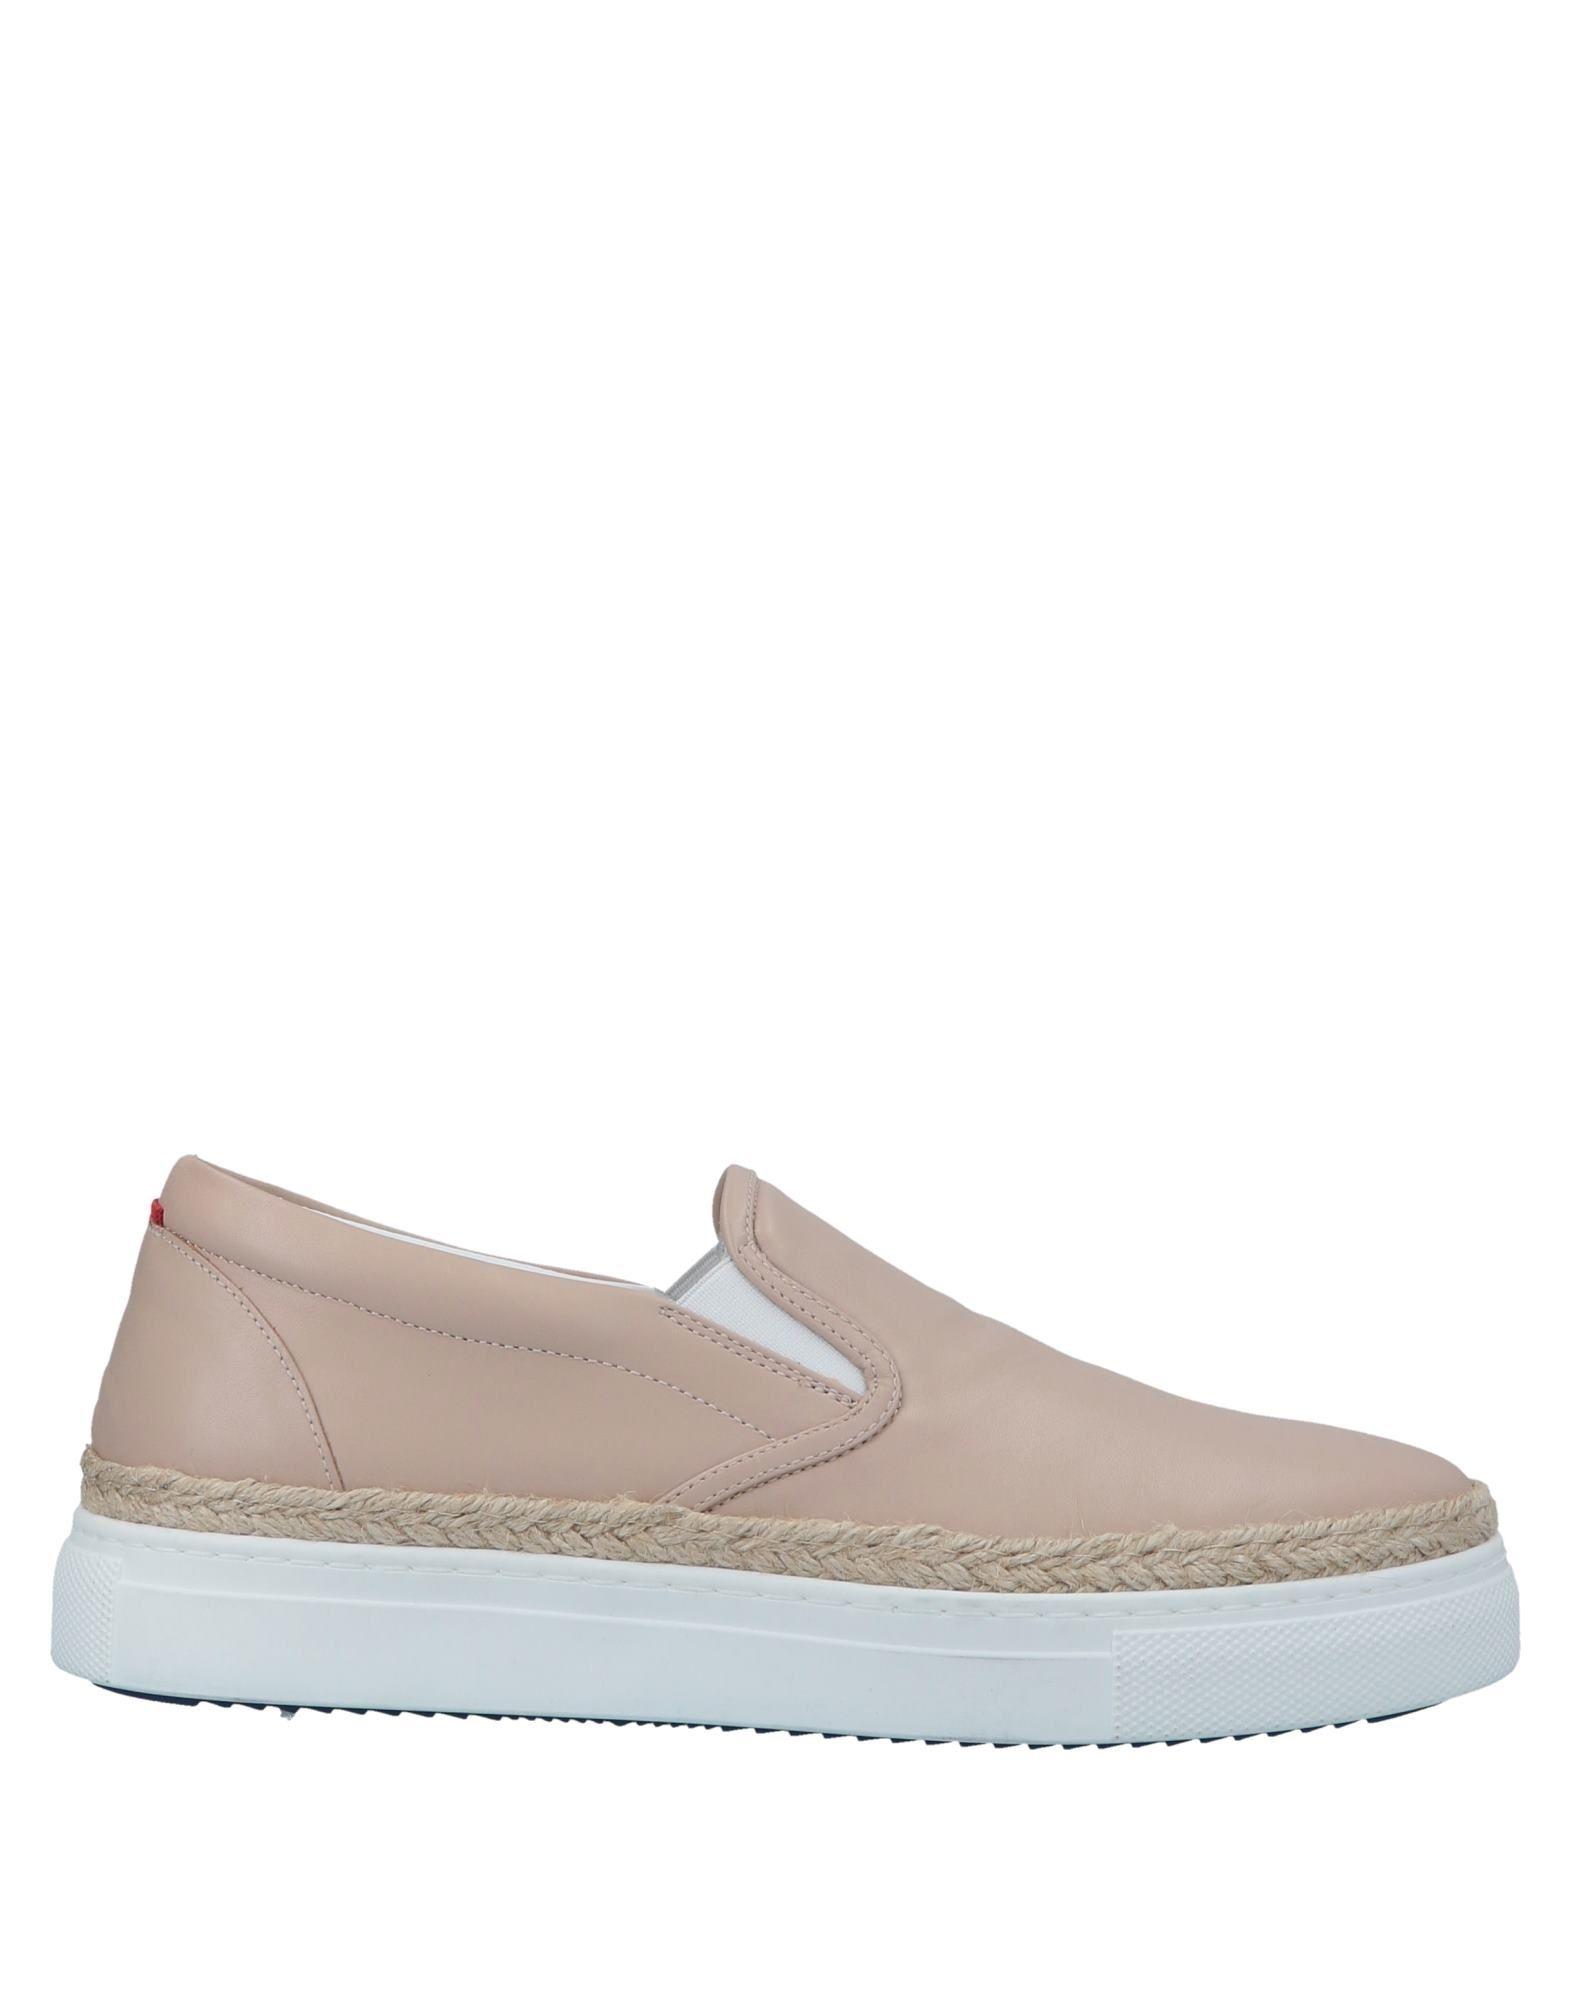 Stilvolle billige Schuhe Hugo Sneakers 11584577XP Damen  11584577XP Sneakers 74ad4d